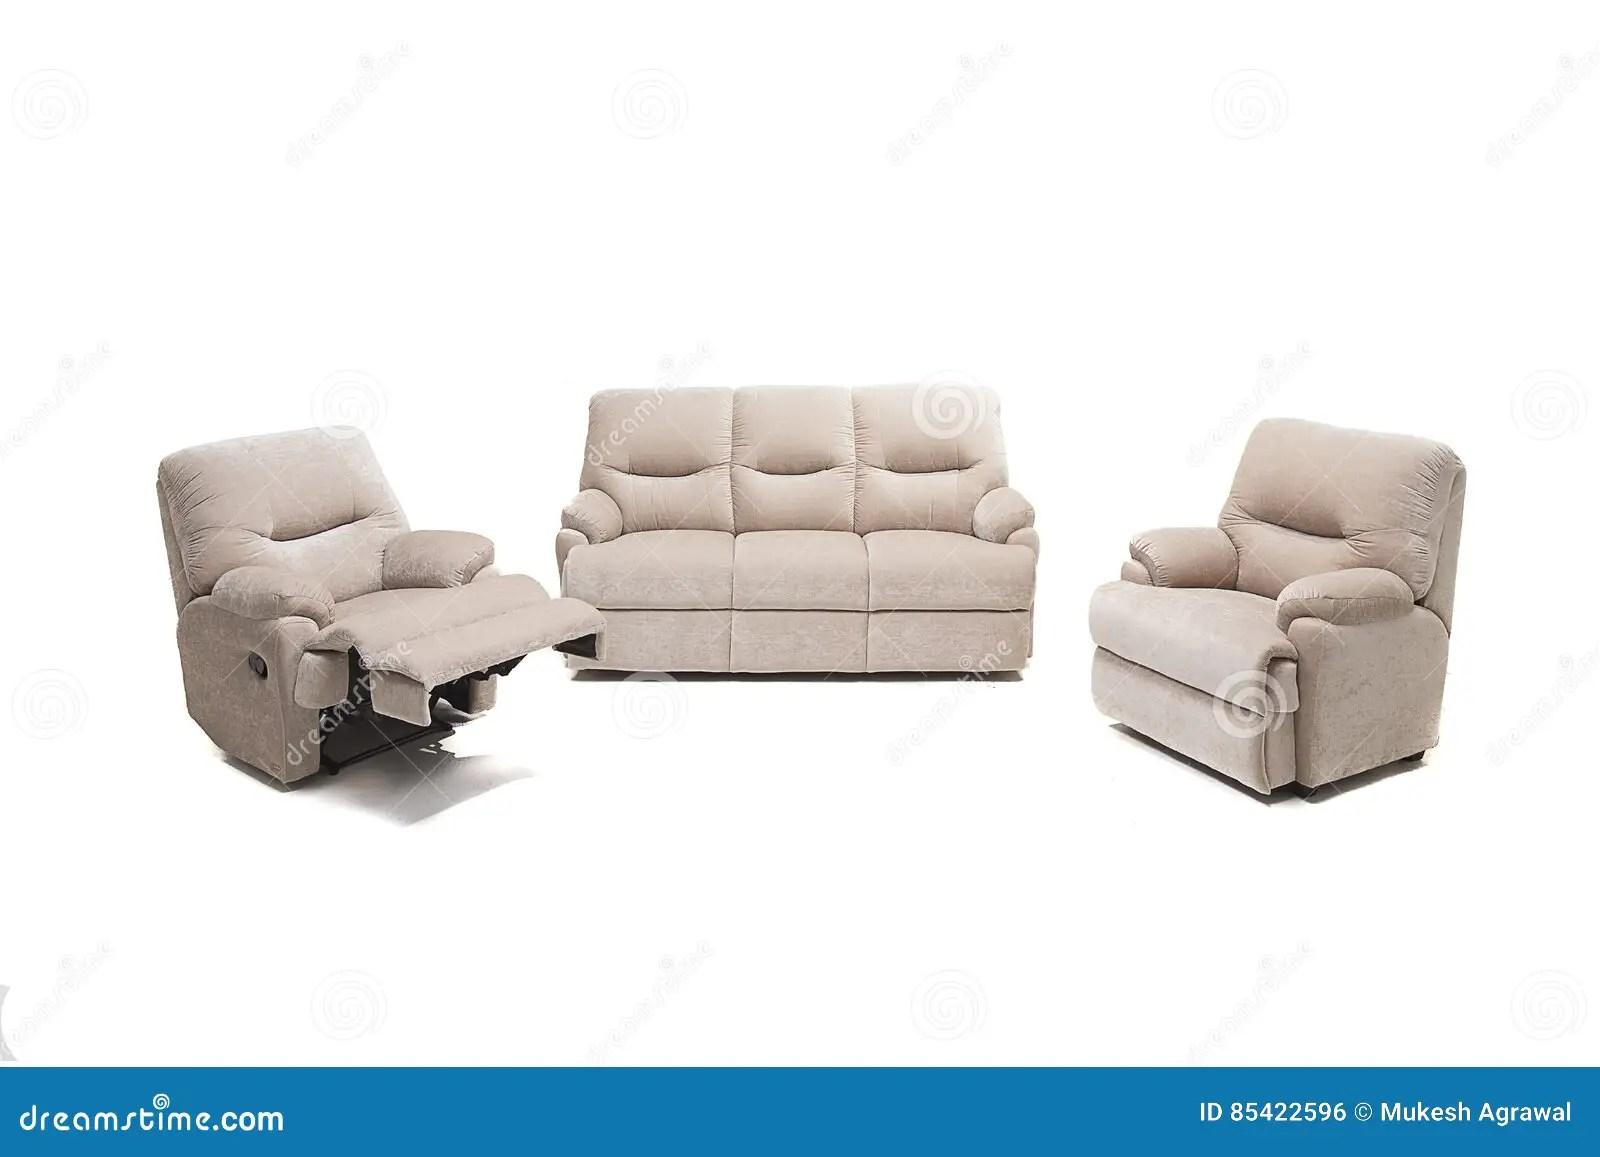 beige colour sofa set masoli beautiful leather color on a white royalty free